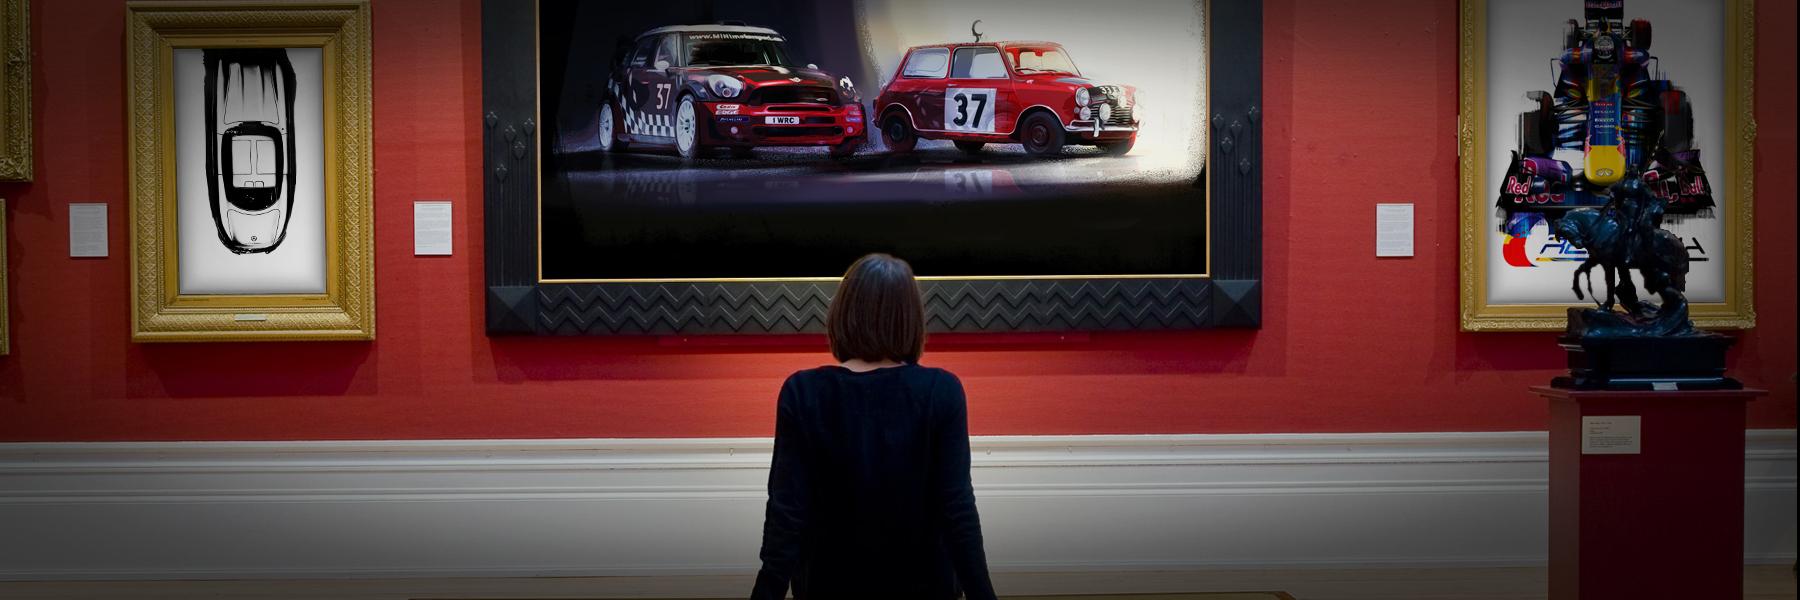 Reforma-Car-Art